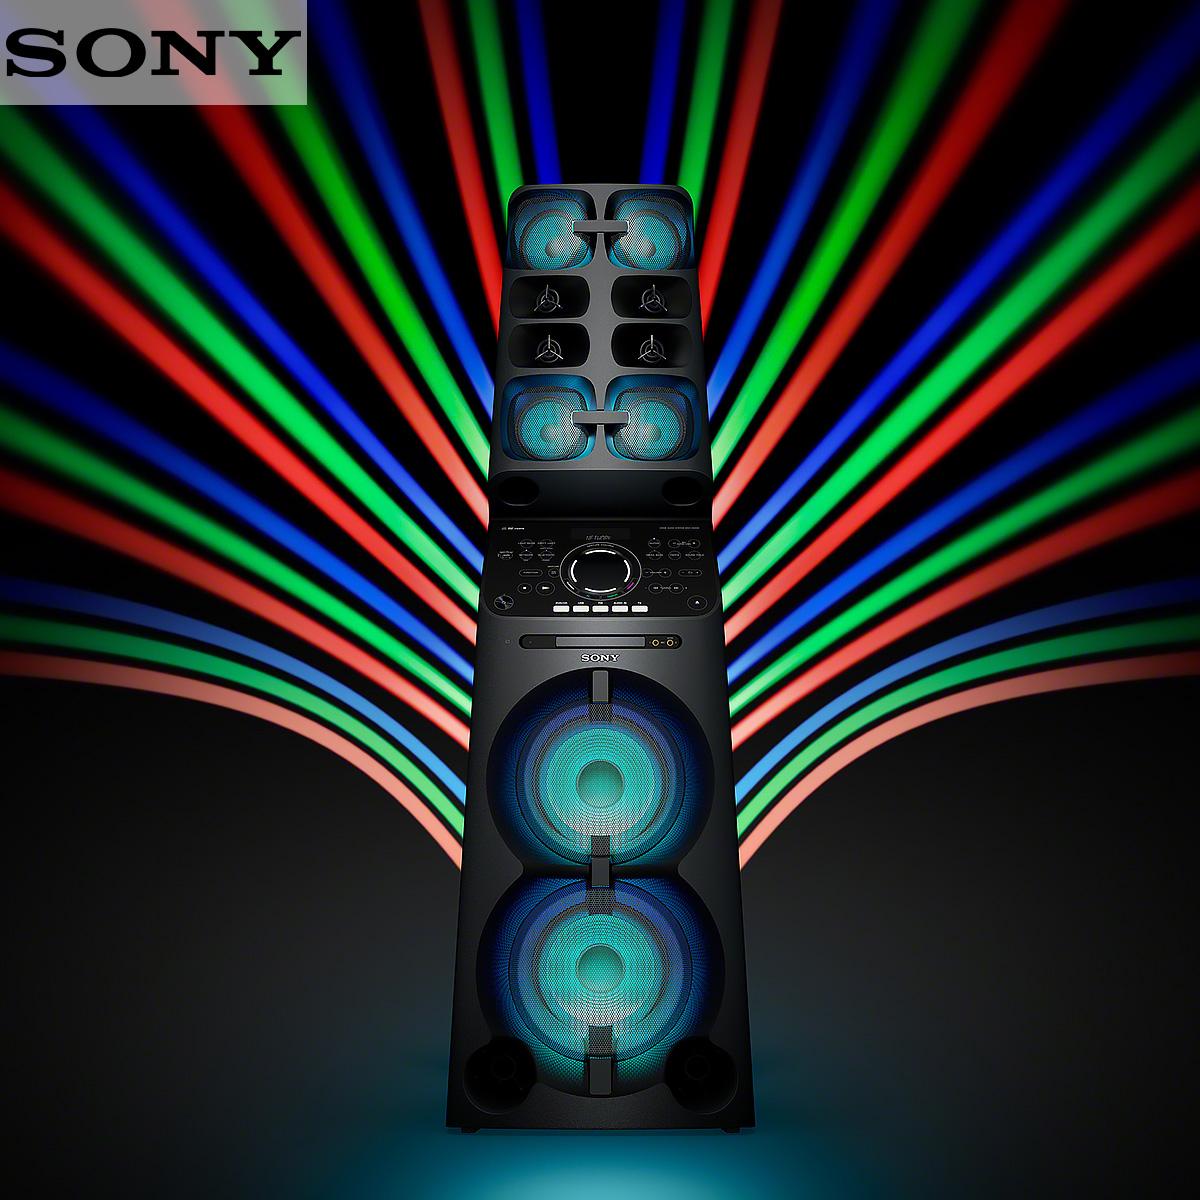 SONY High Power Home Audio Bluetooth Wi-Fi System - MHCV90DW